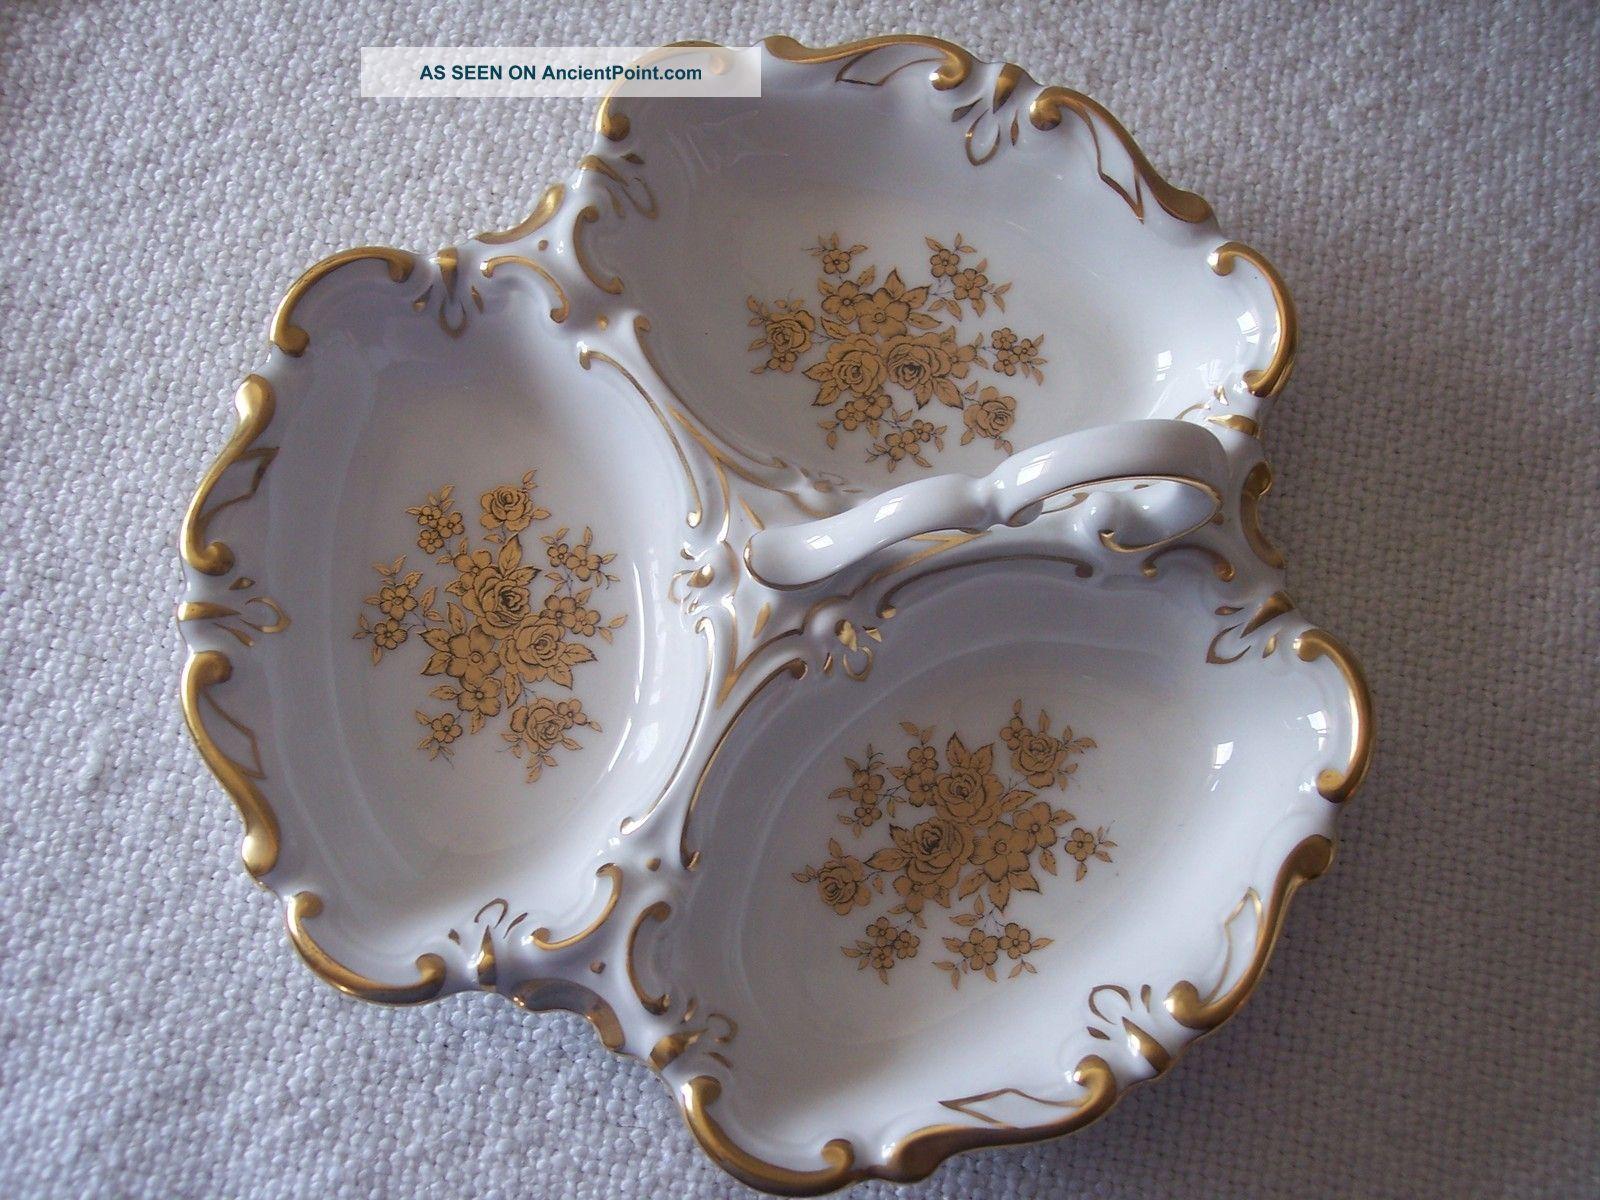 Jlmenau Rare Graf Von Henneberg Porcelain Relish Tray Germany Platters & Trays photo